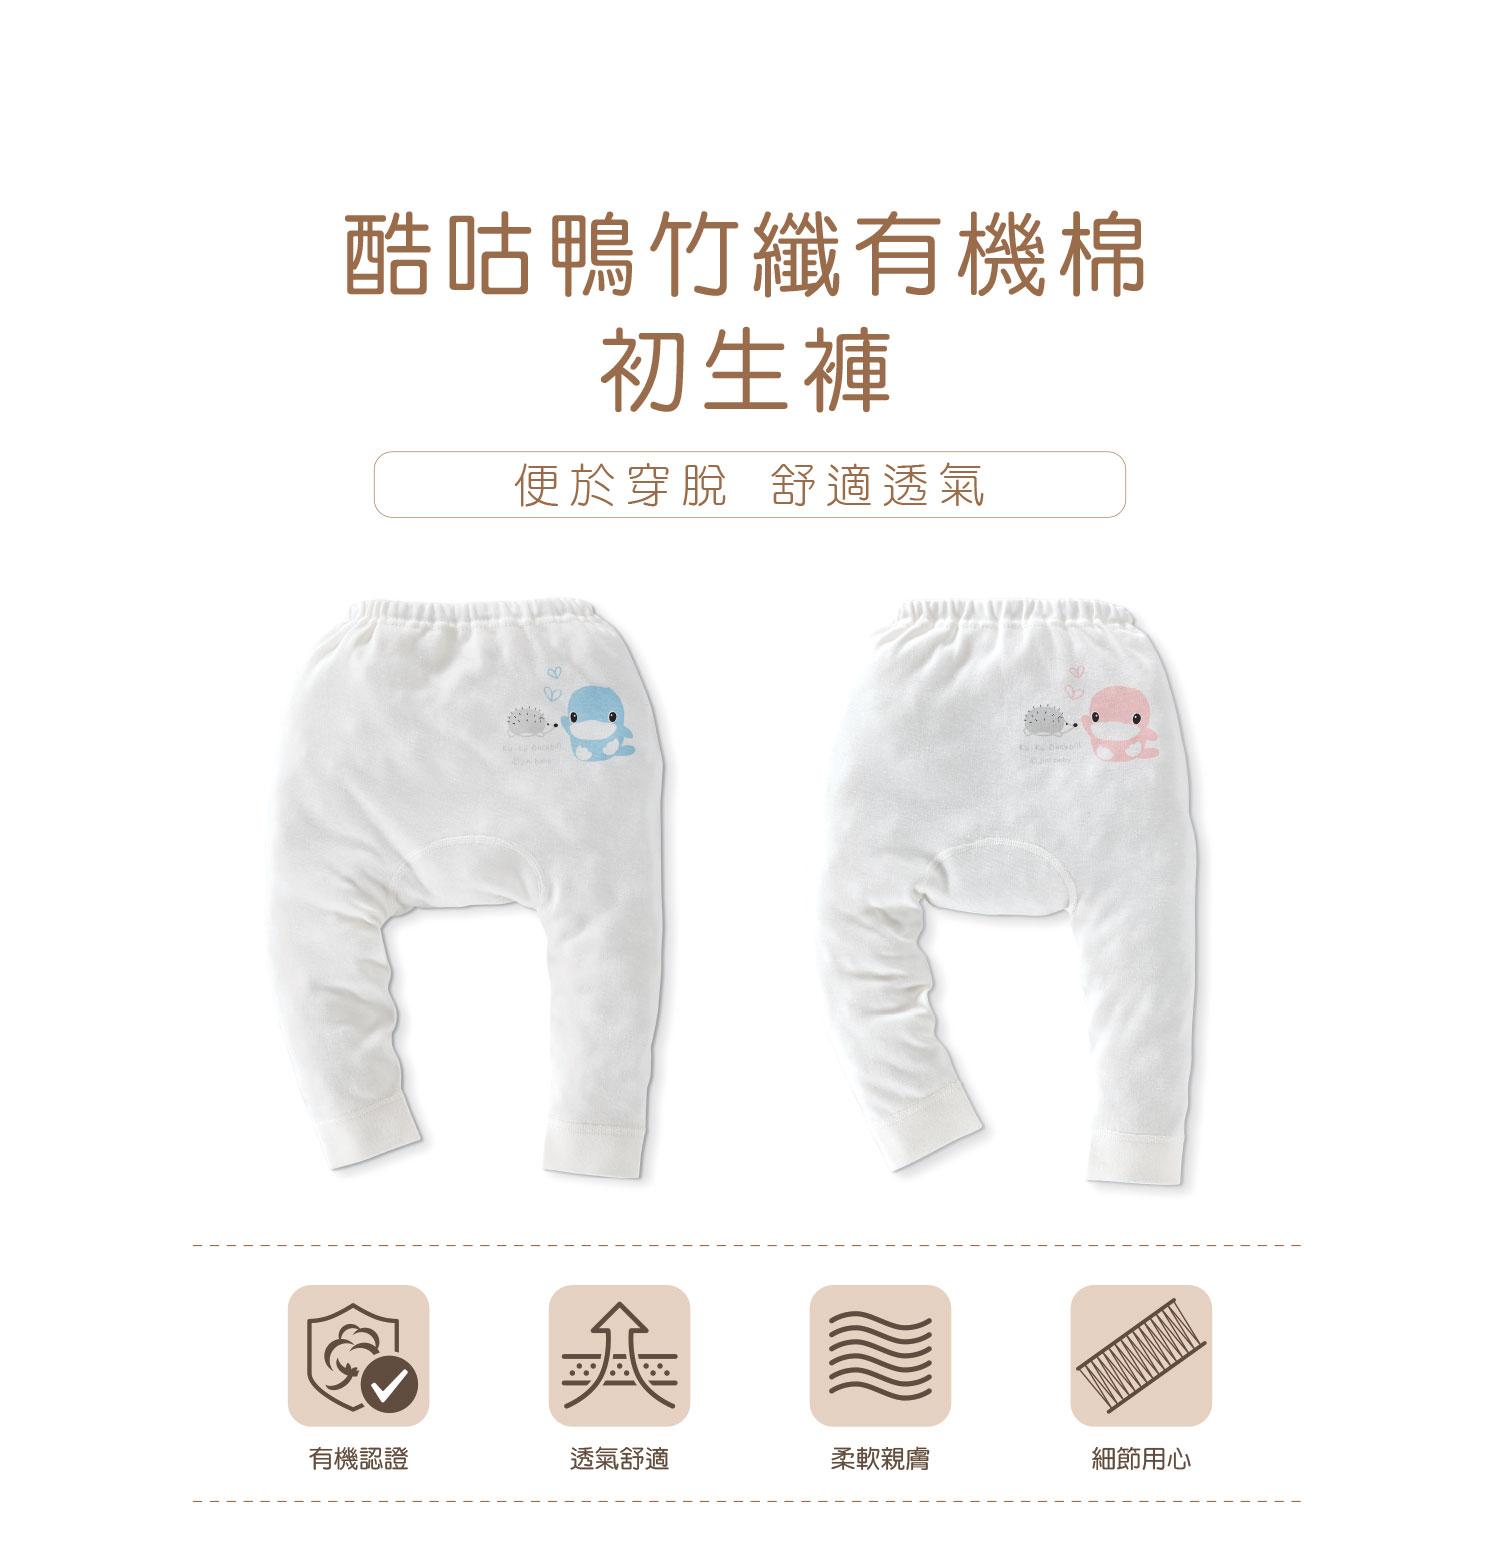 proimages/Cottons&BabyClothing/Organic_Bamboo/2770/2770_1.jpg